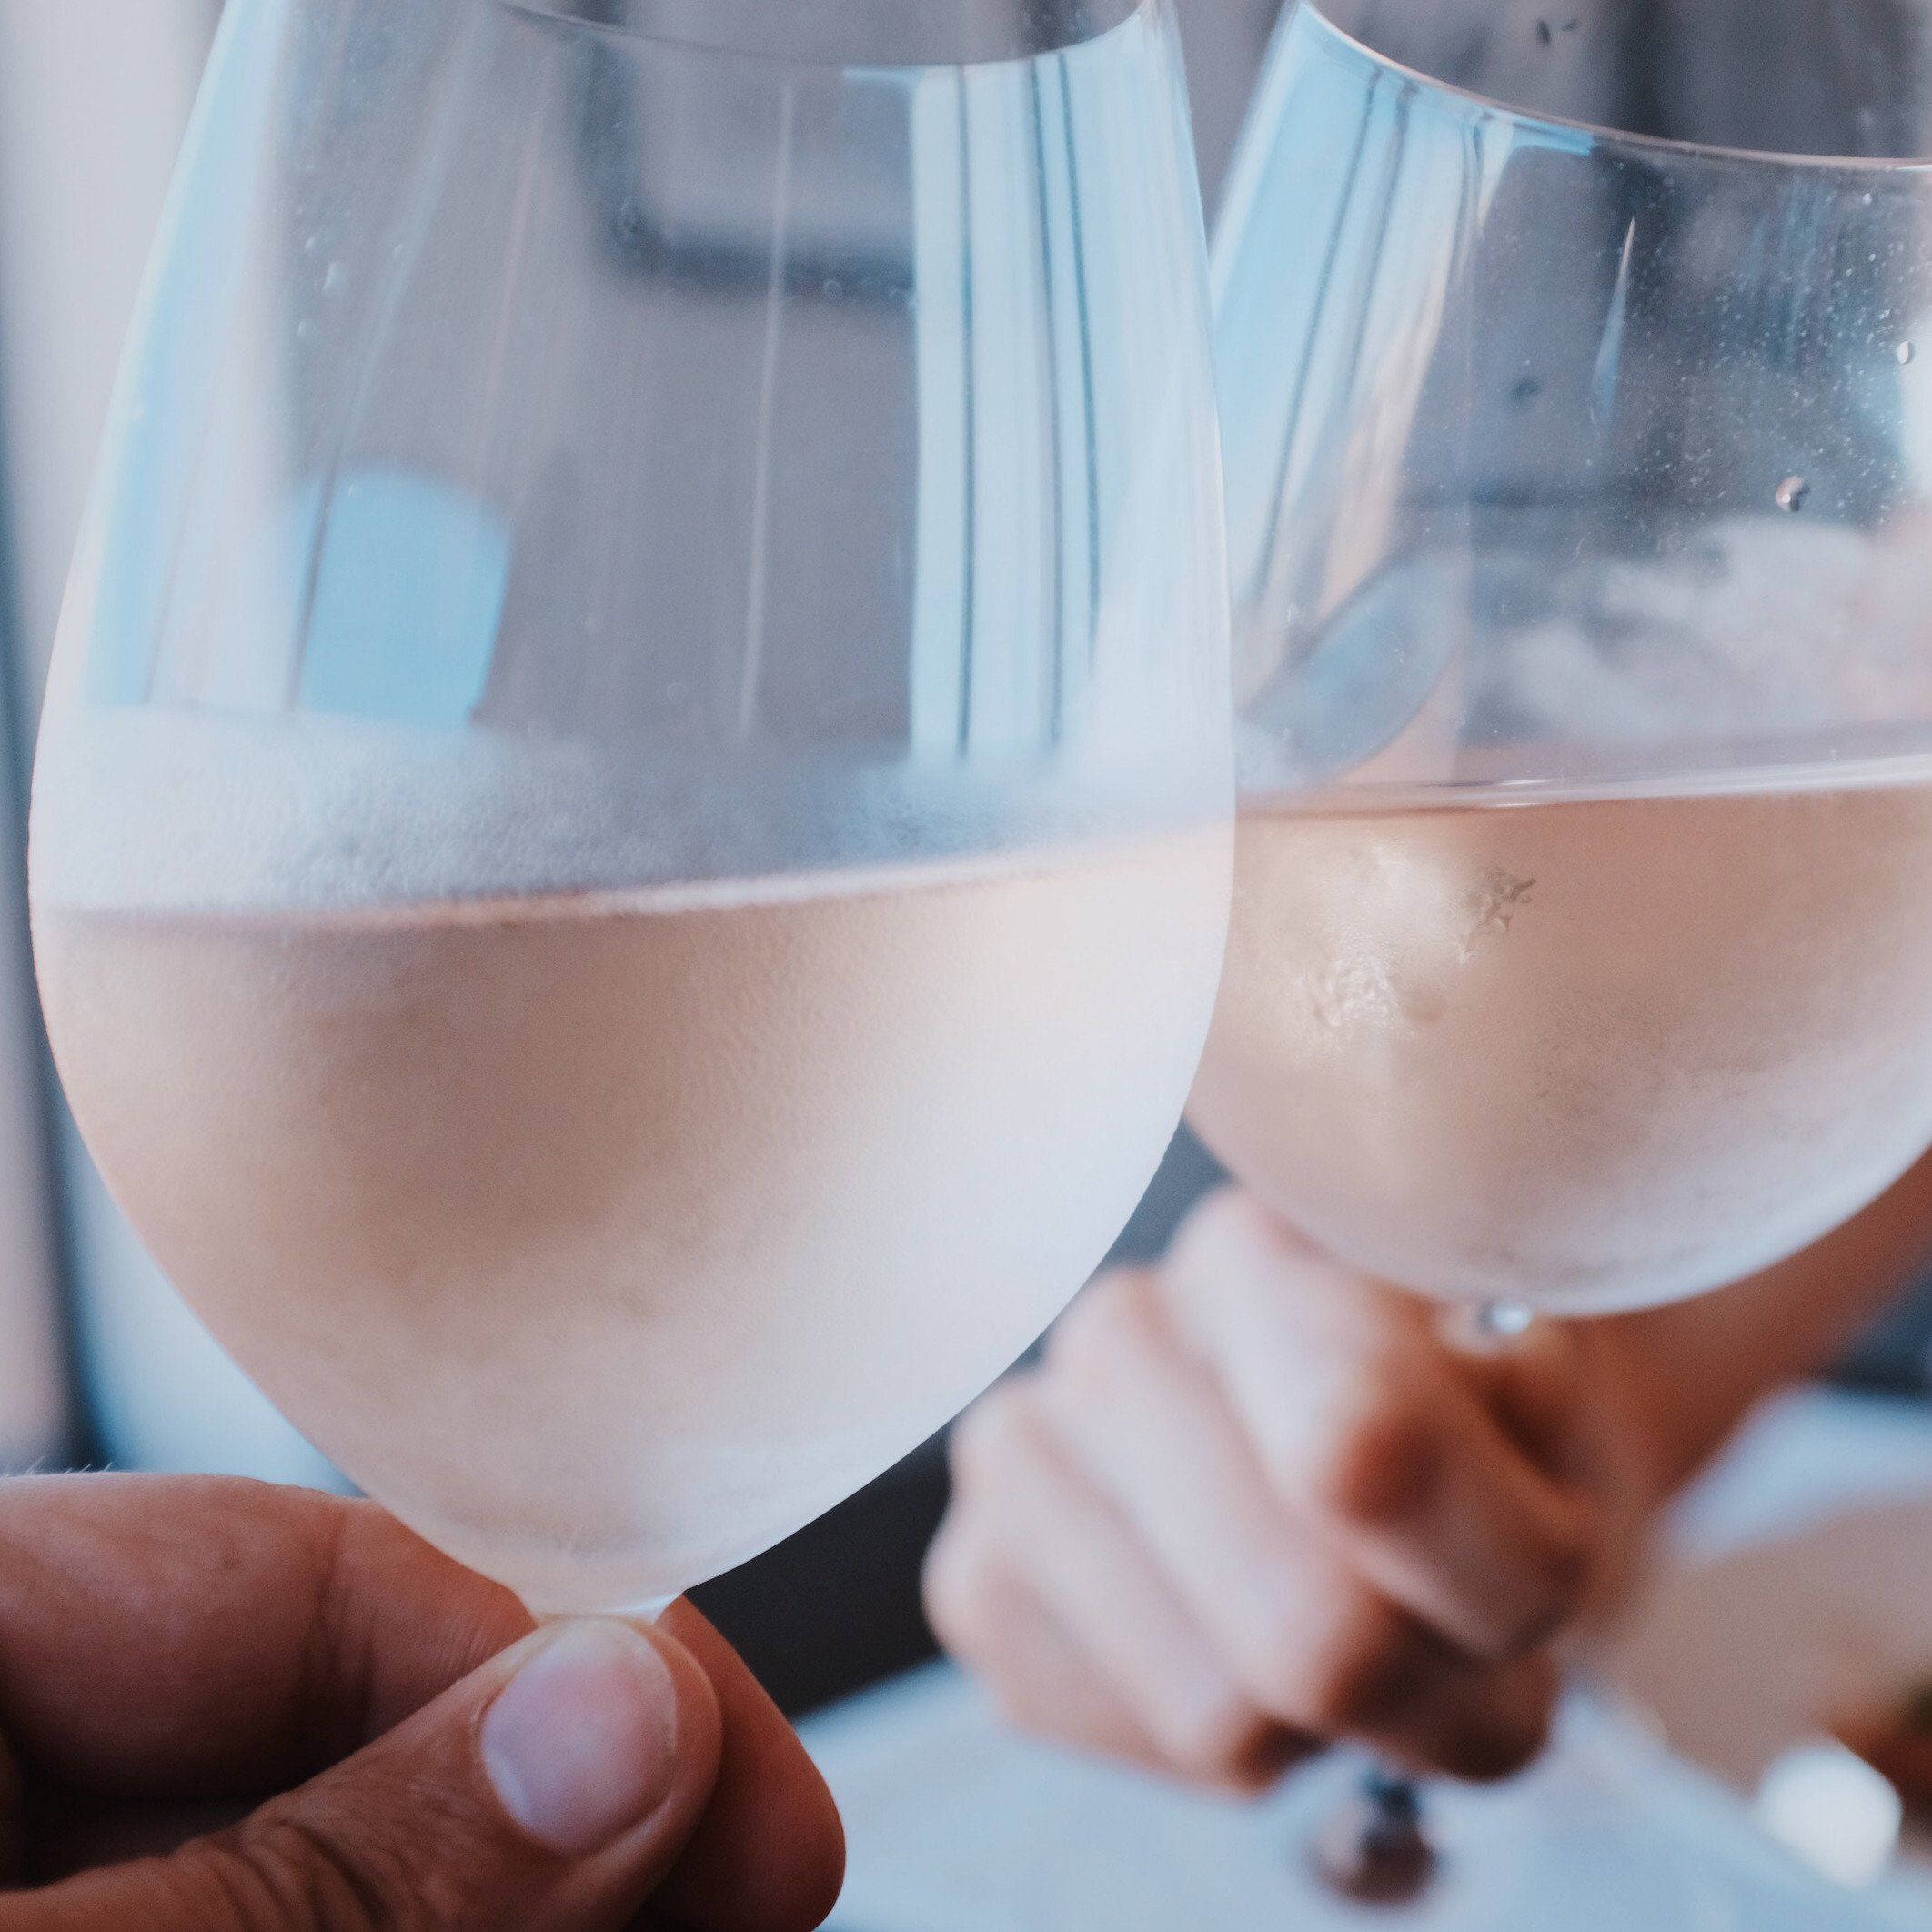 Group wine tasting for 4 people